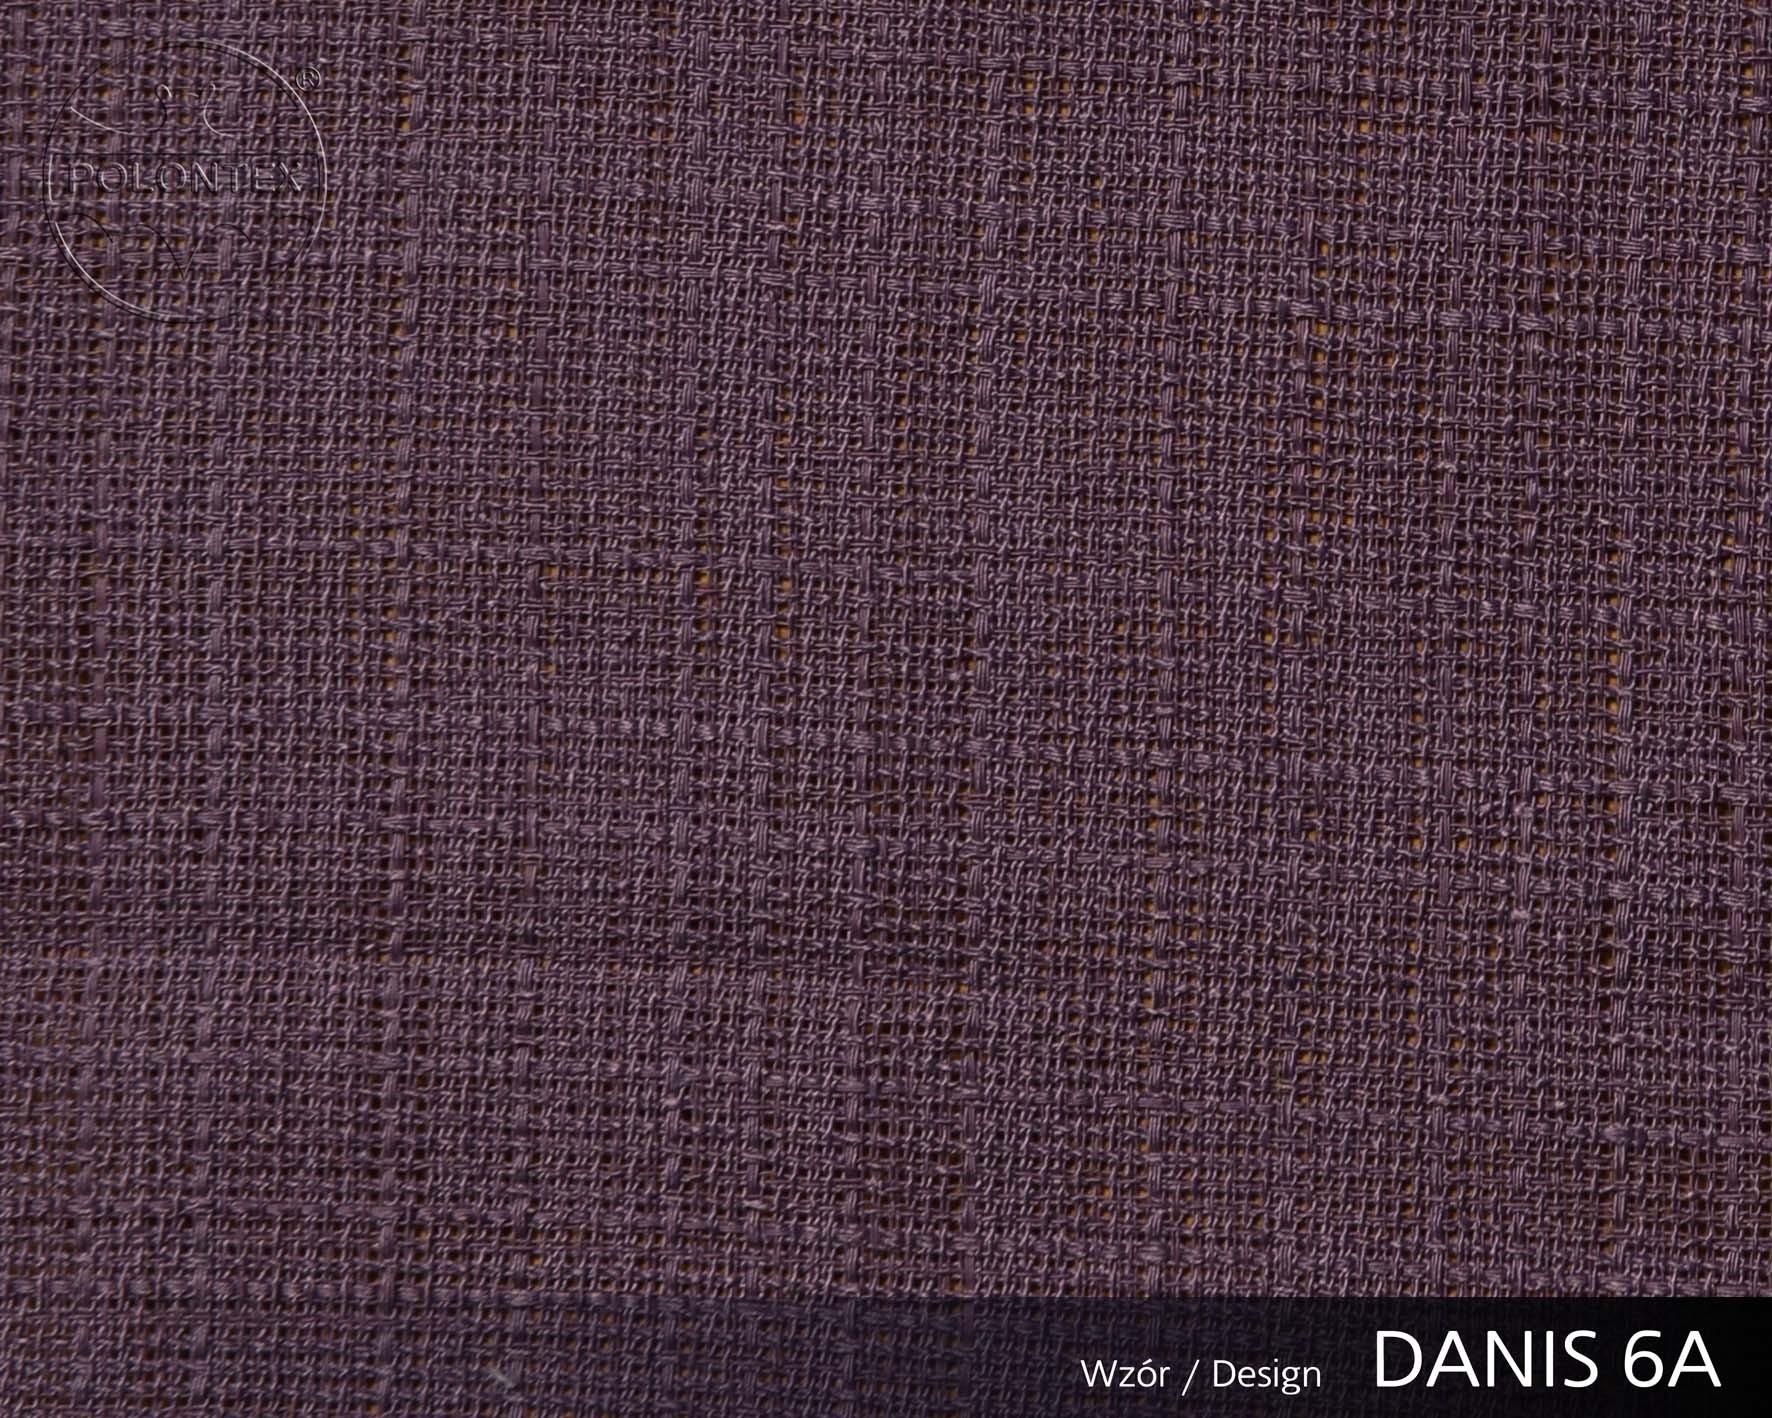 DANIŚ 4036